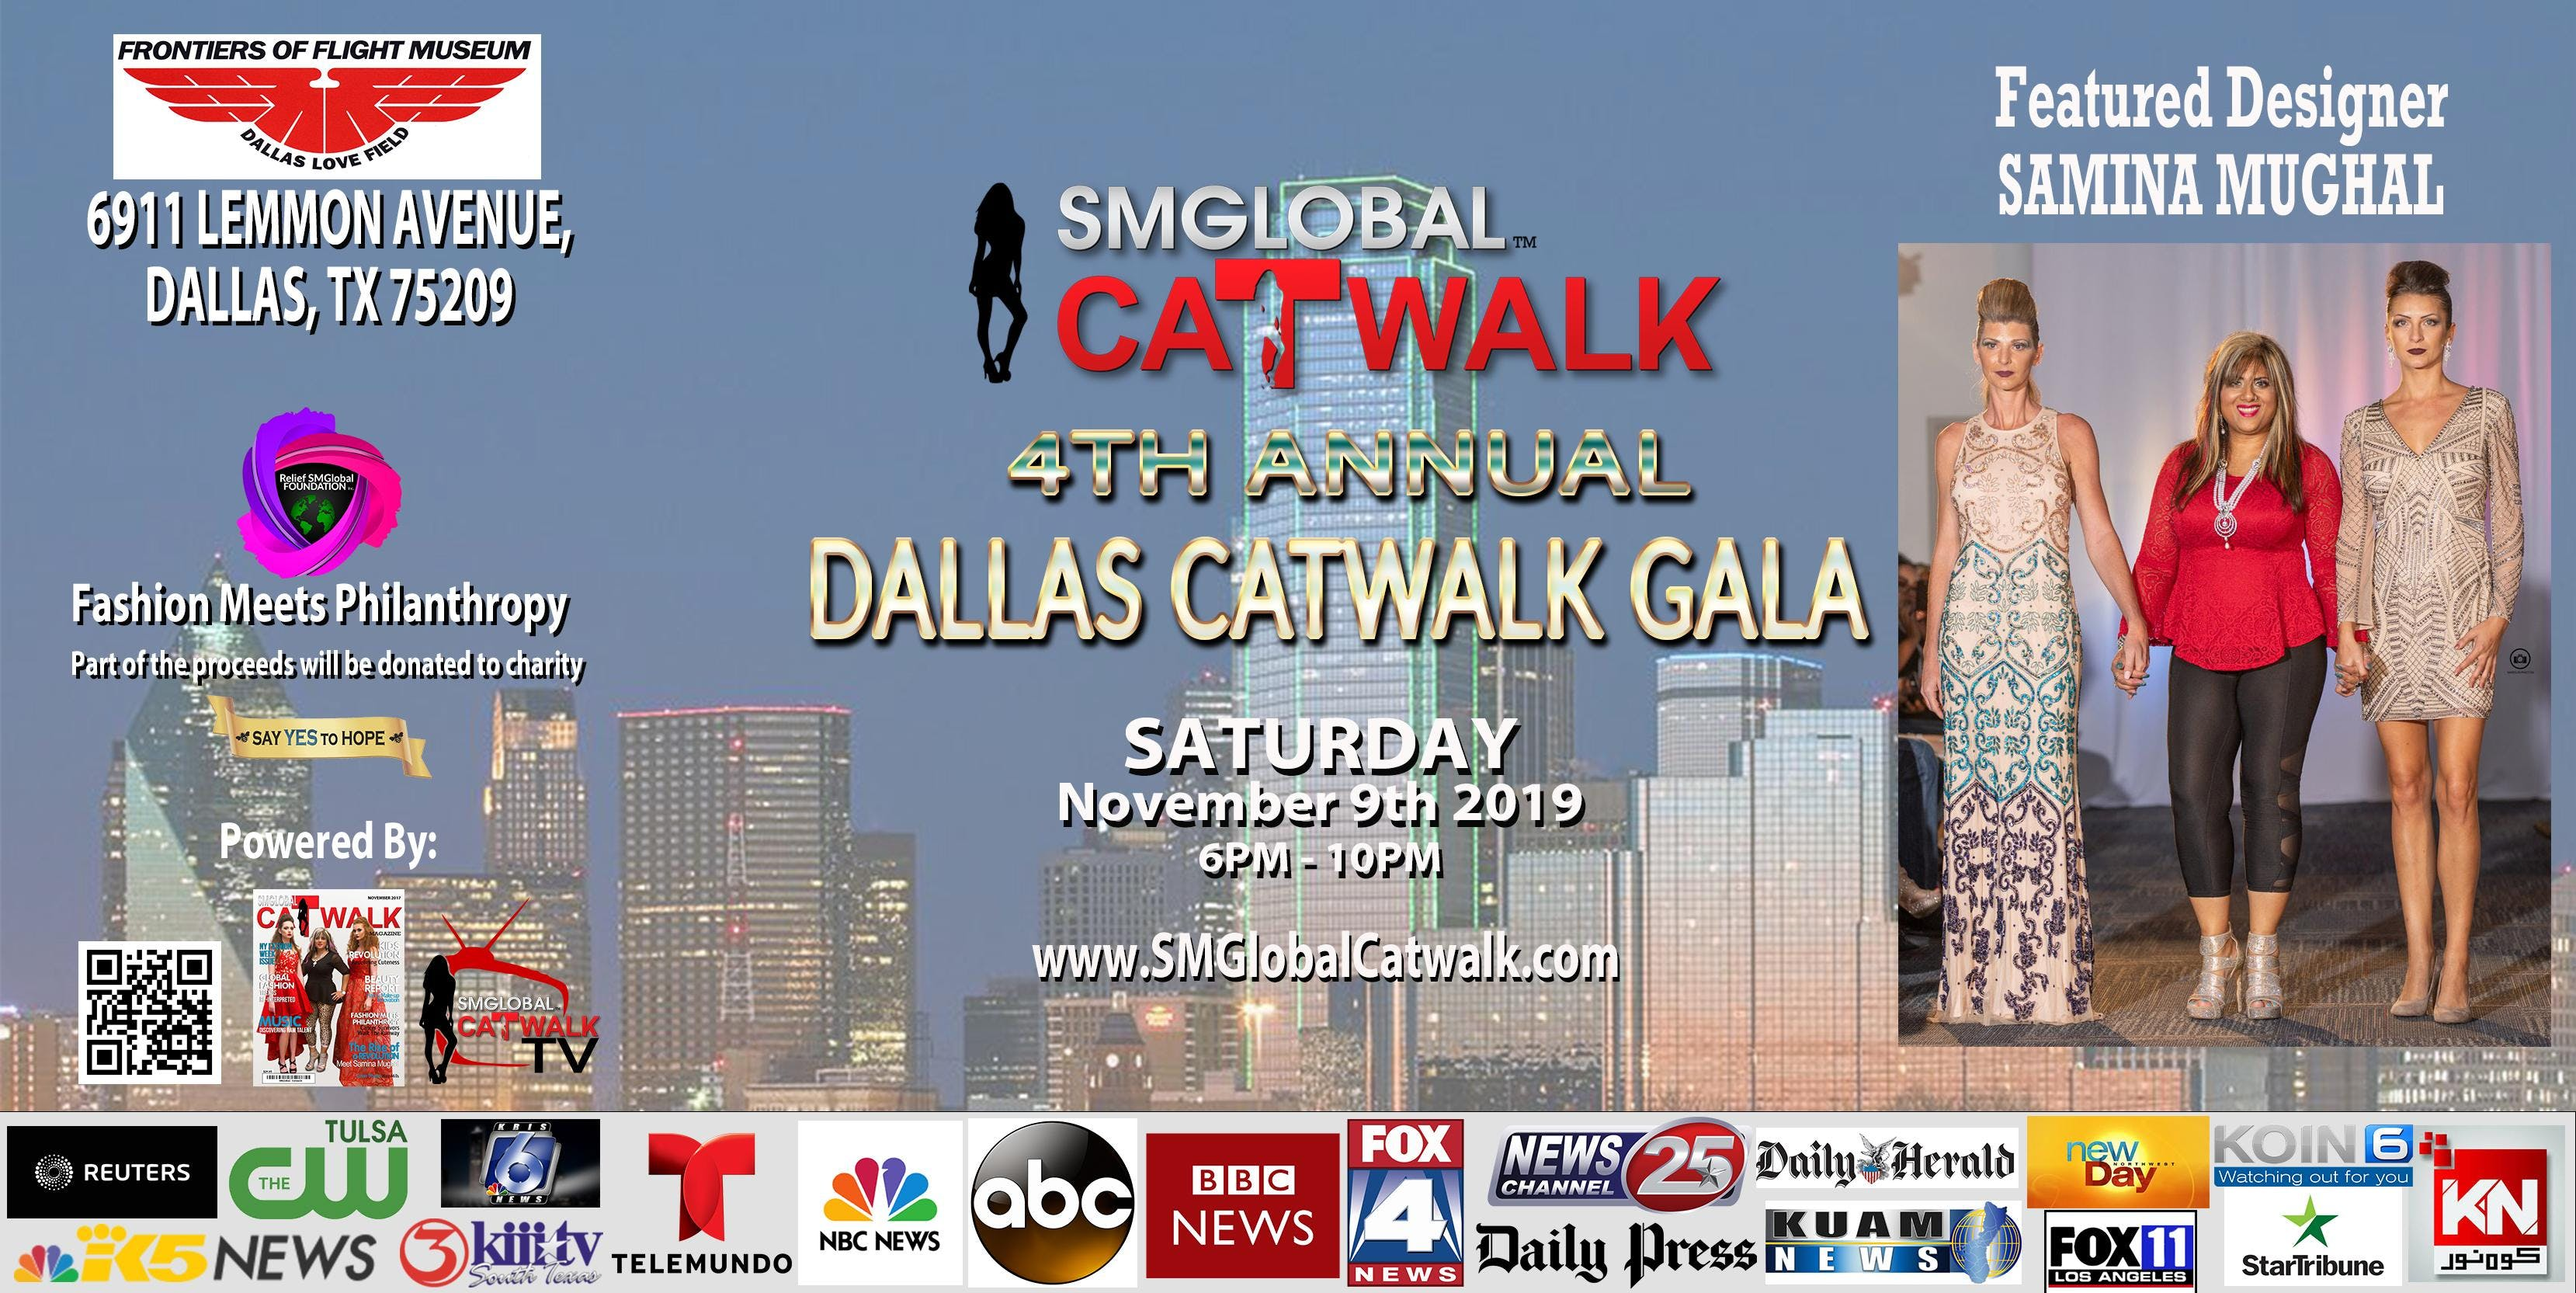 SMGlobal Catwalk - 4th Annual DALLAS CATWALK GALA - 11.9.19